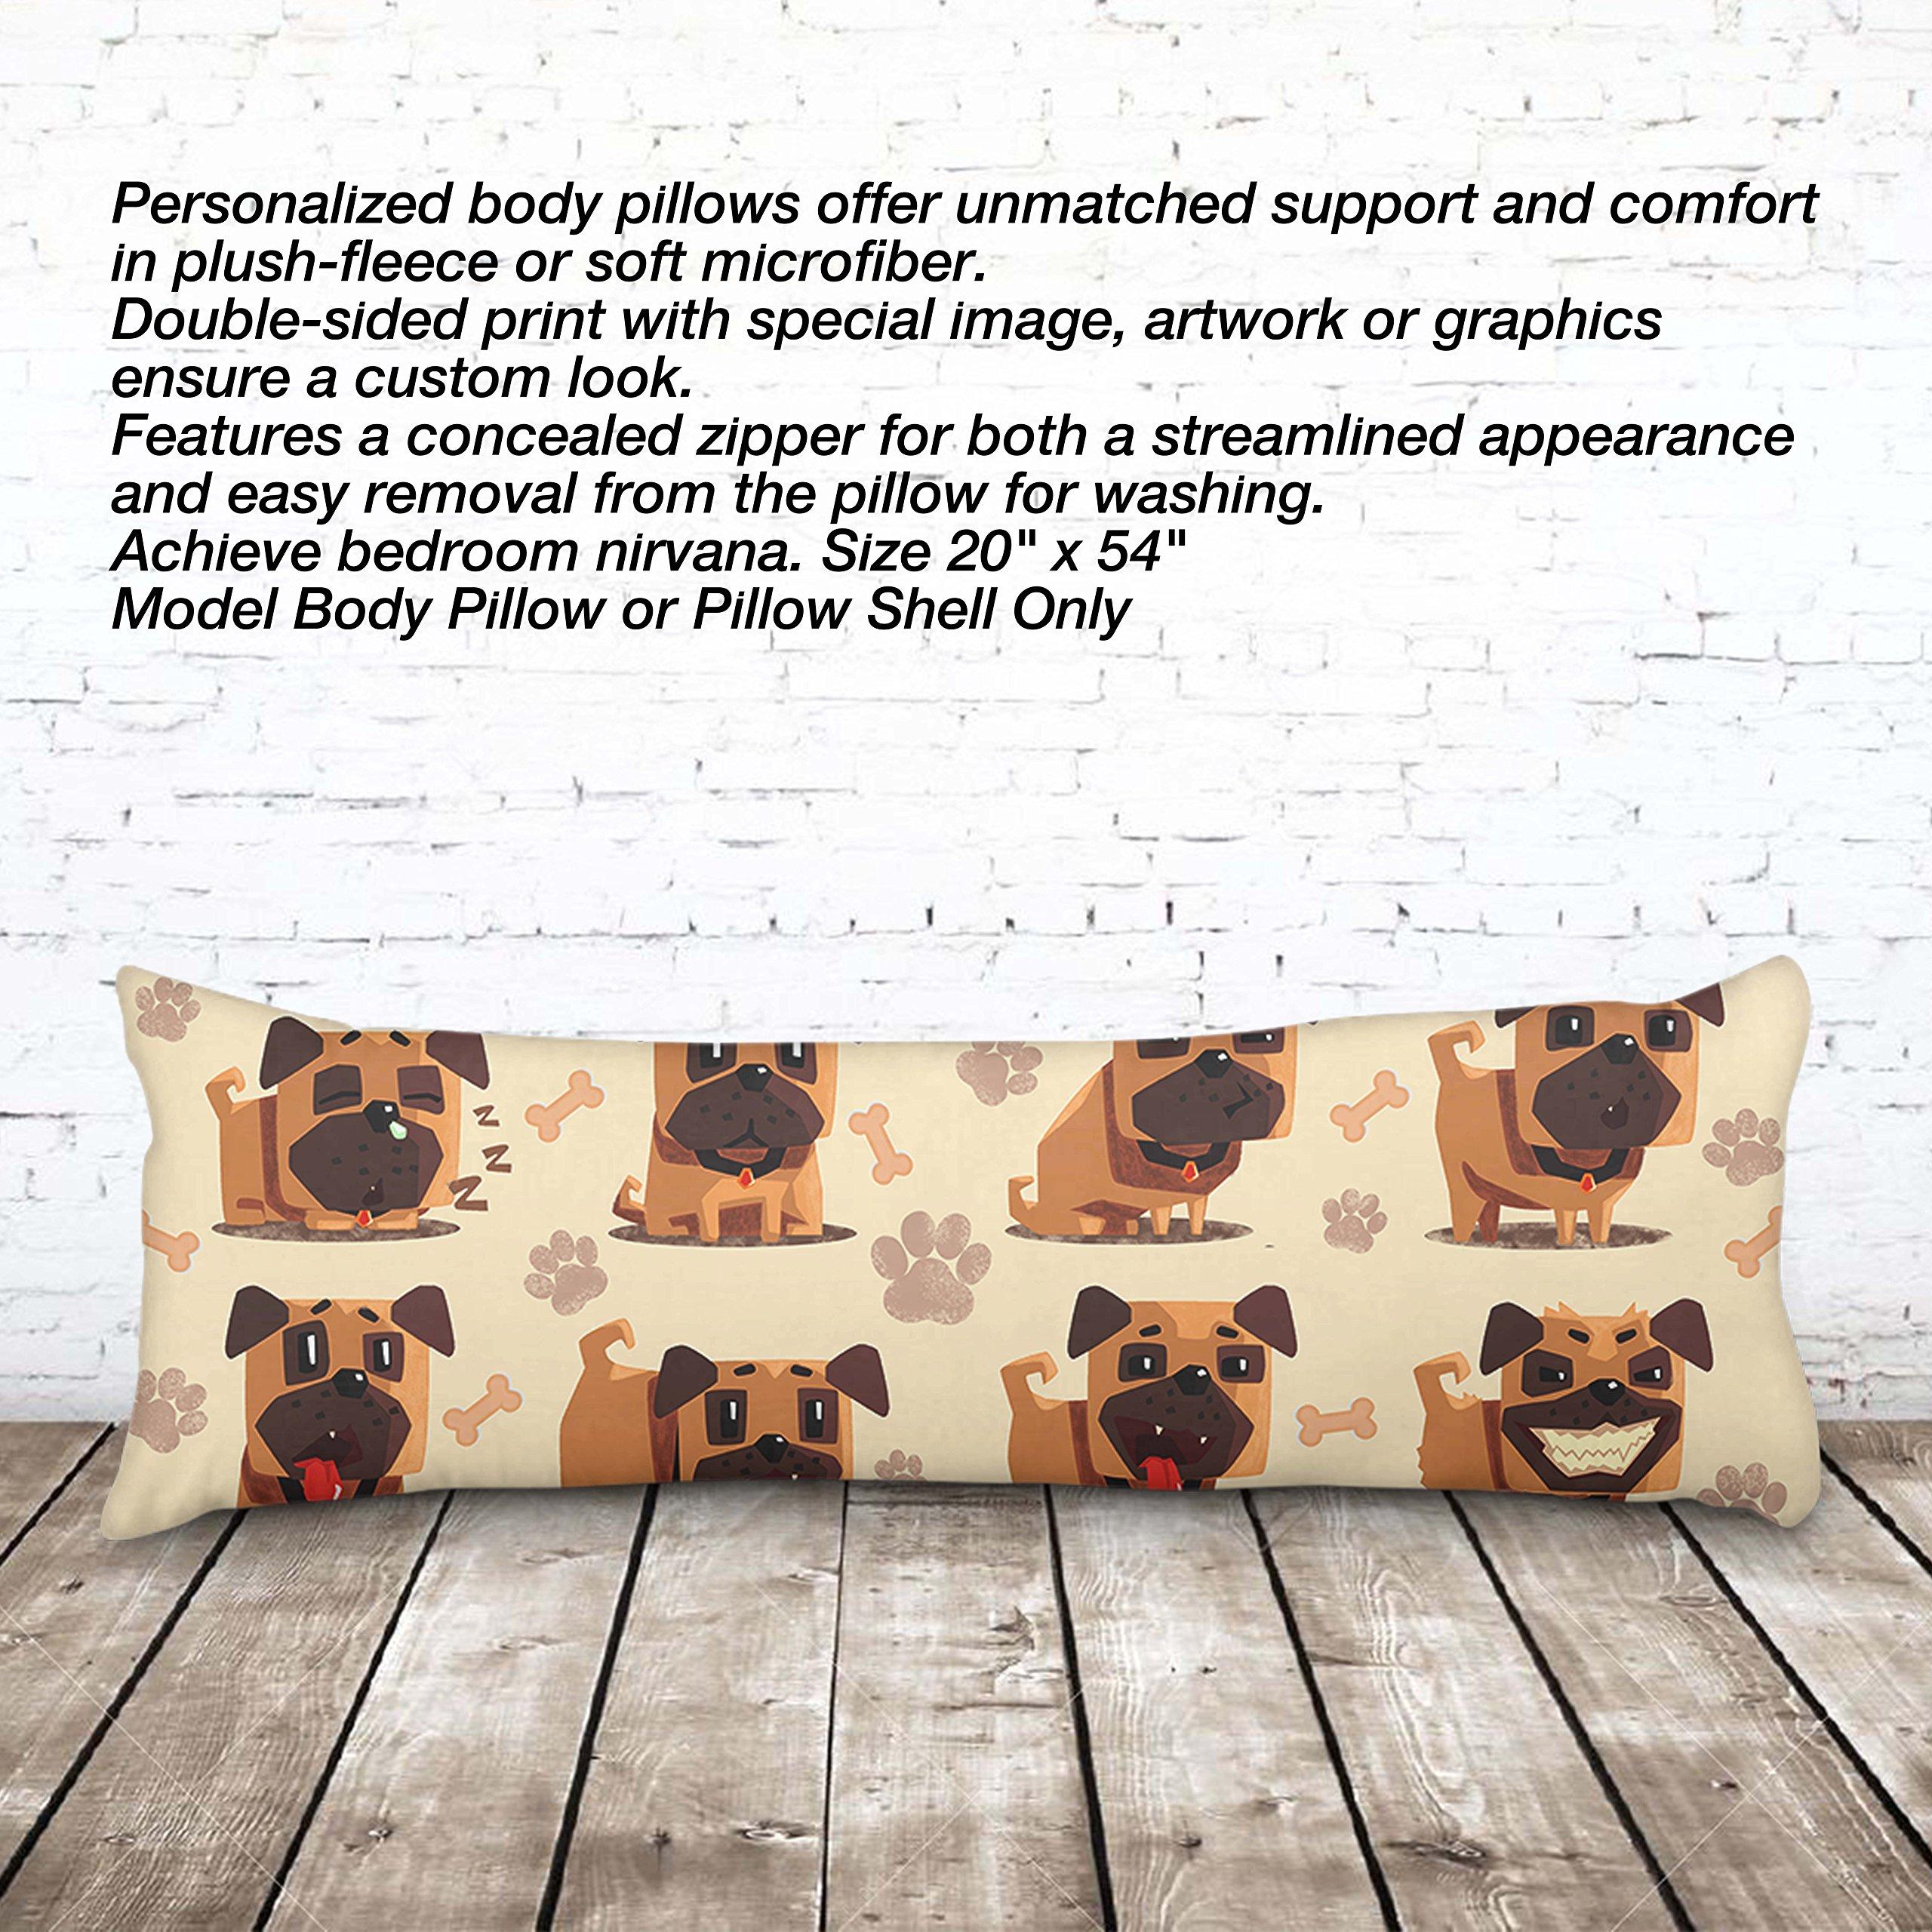 VOTANTA - Bulldog emotions Body Pillow (Body Pillow 100% Polyester, 20x54'')